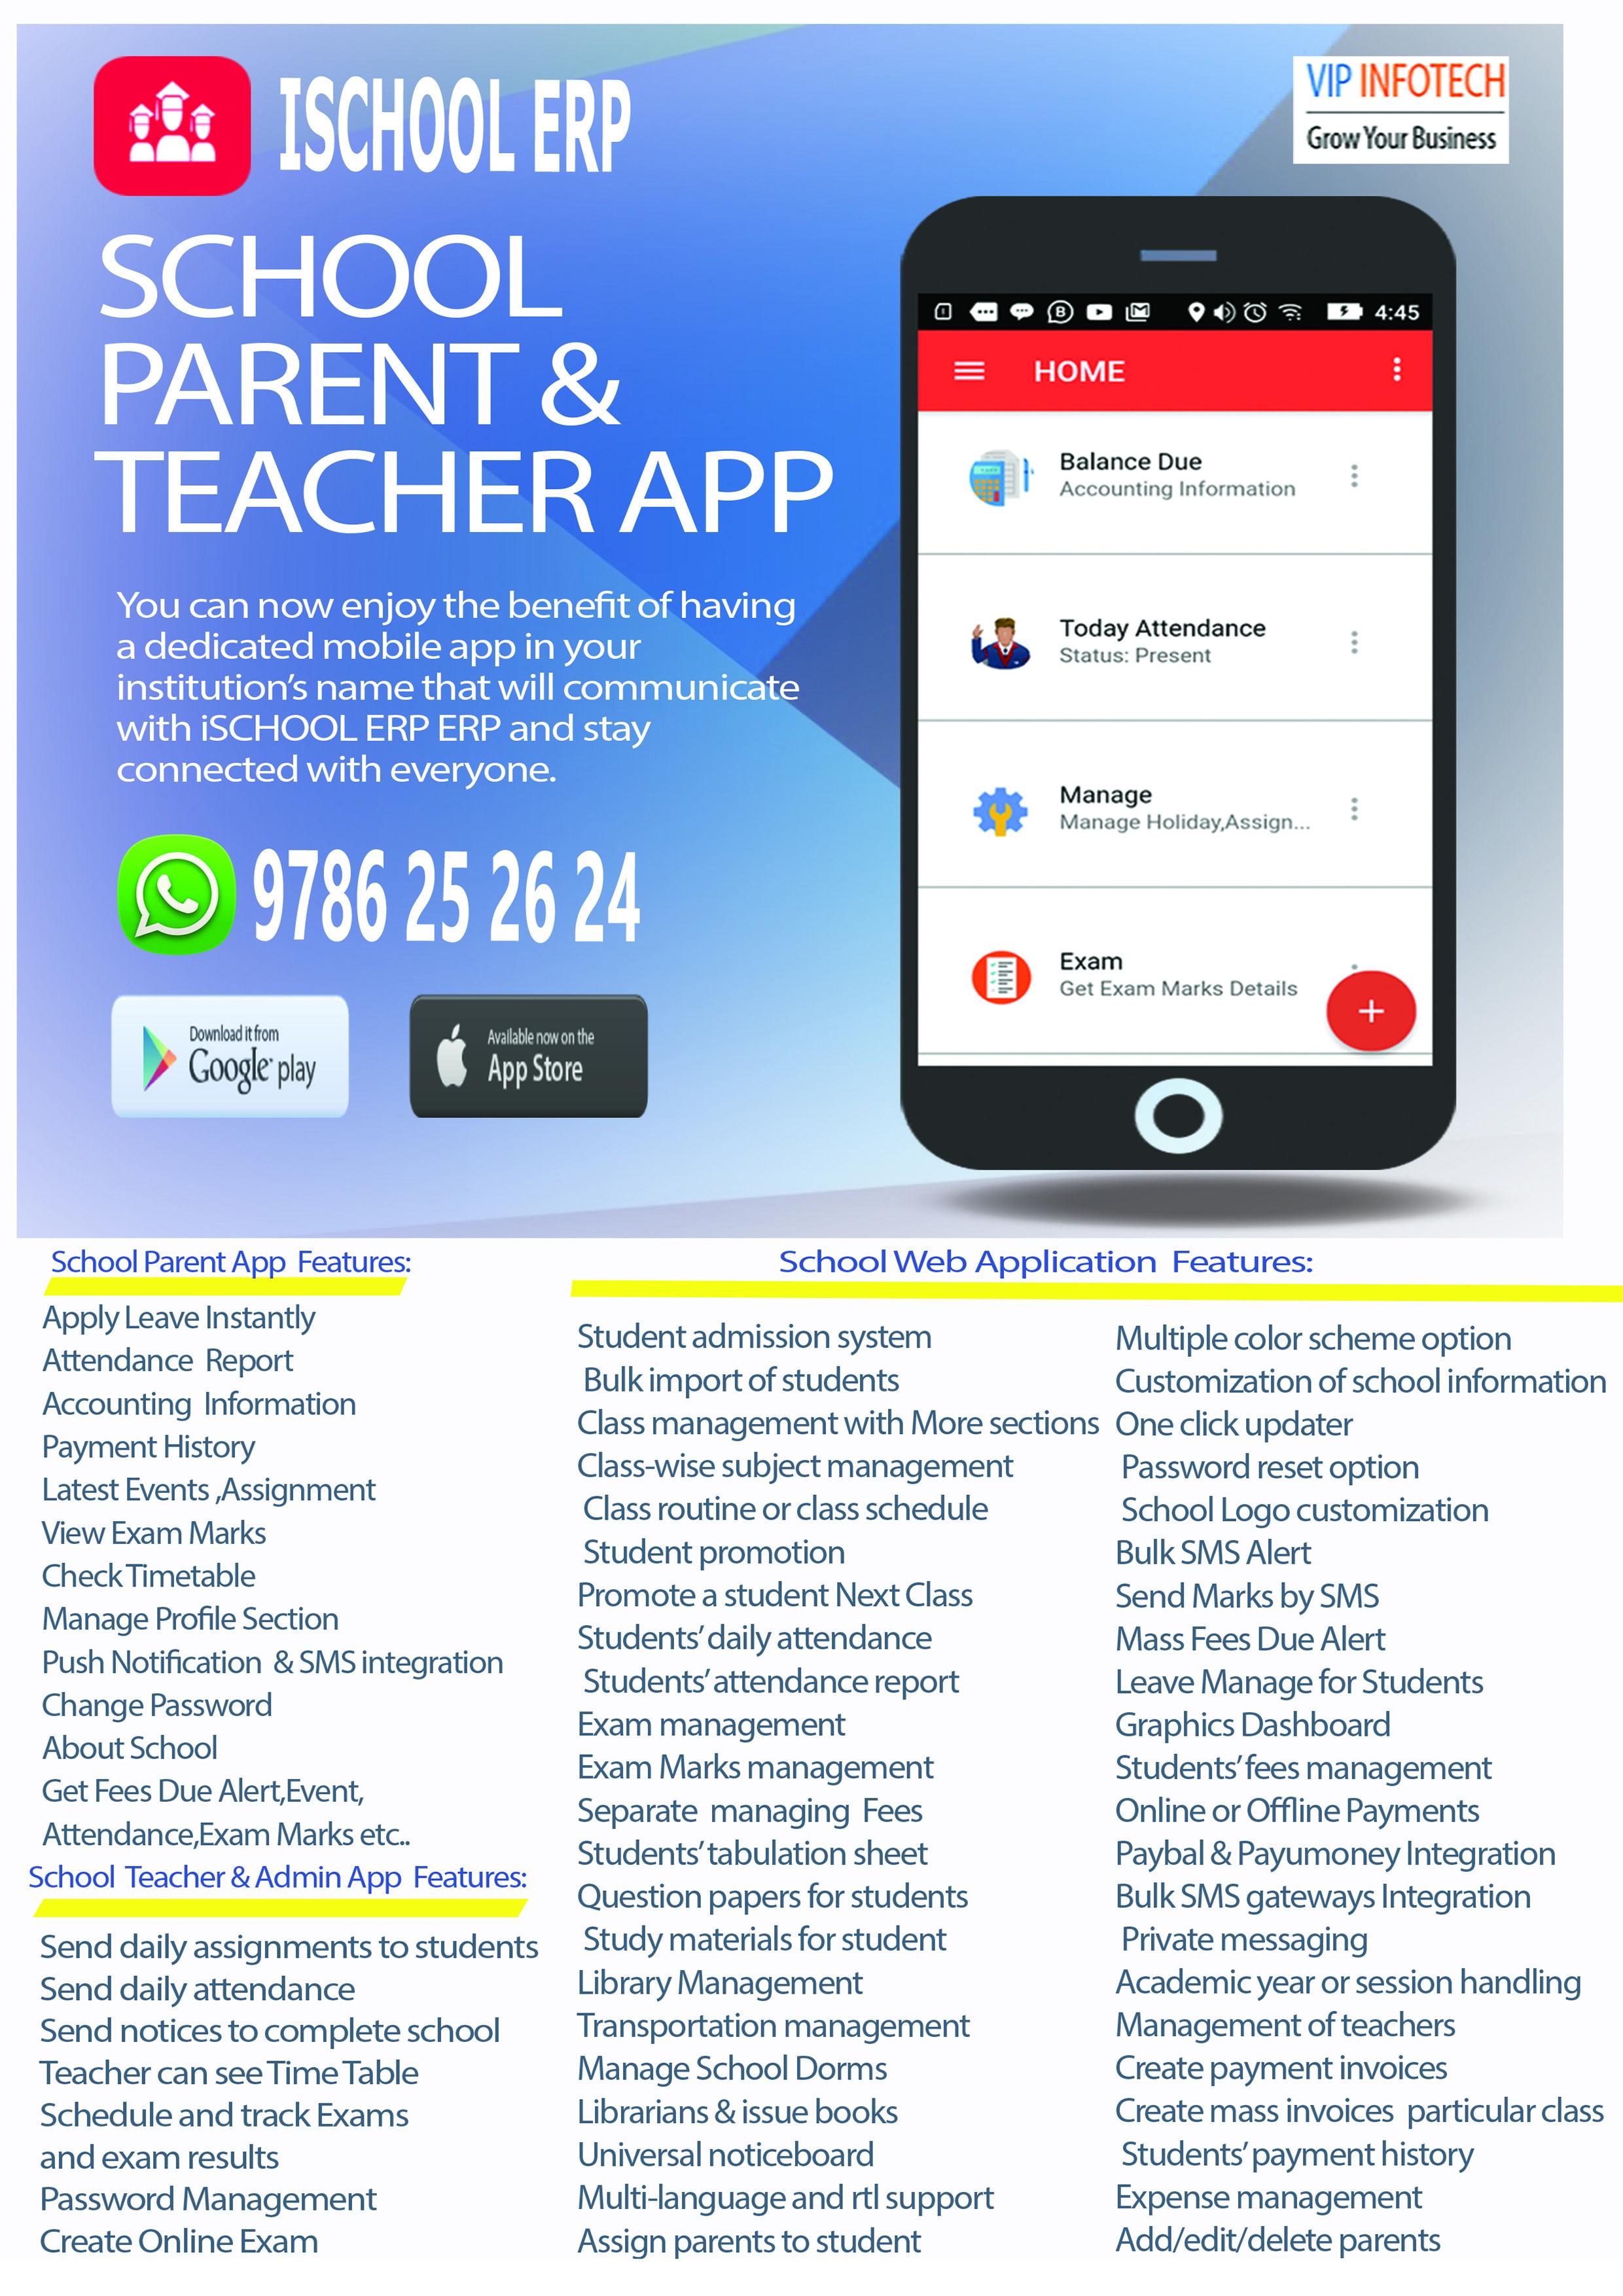 iSCHOOL ERP MODULES : iParent App Modules & Features - Apply